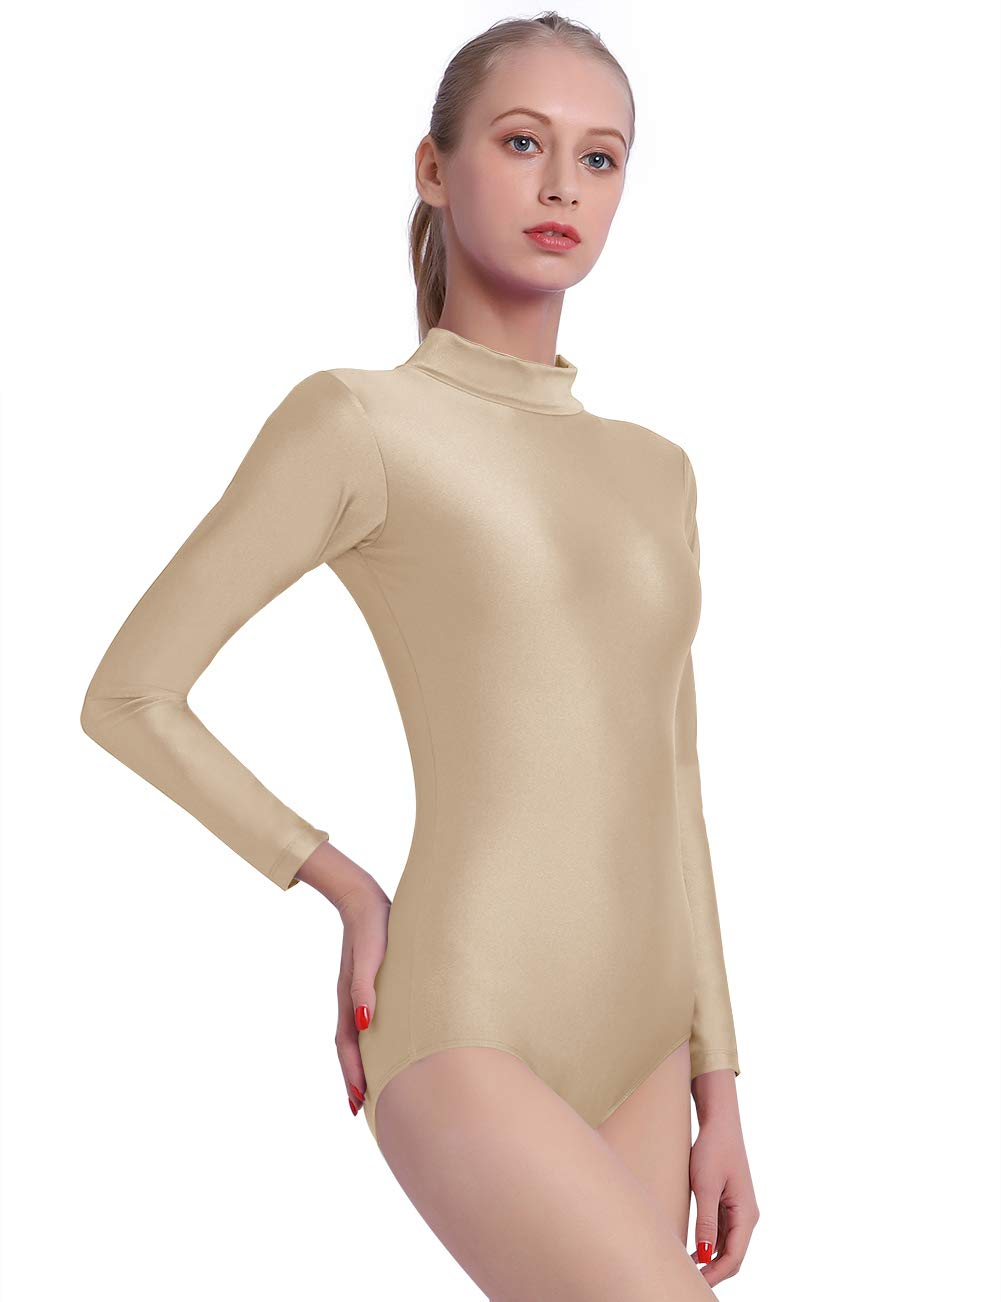 speerise Long Sleeve Adult Ballet Dance Leotards